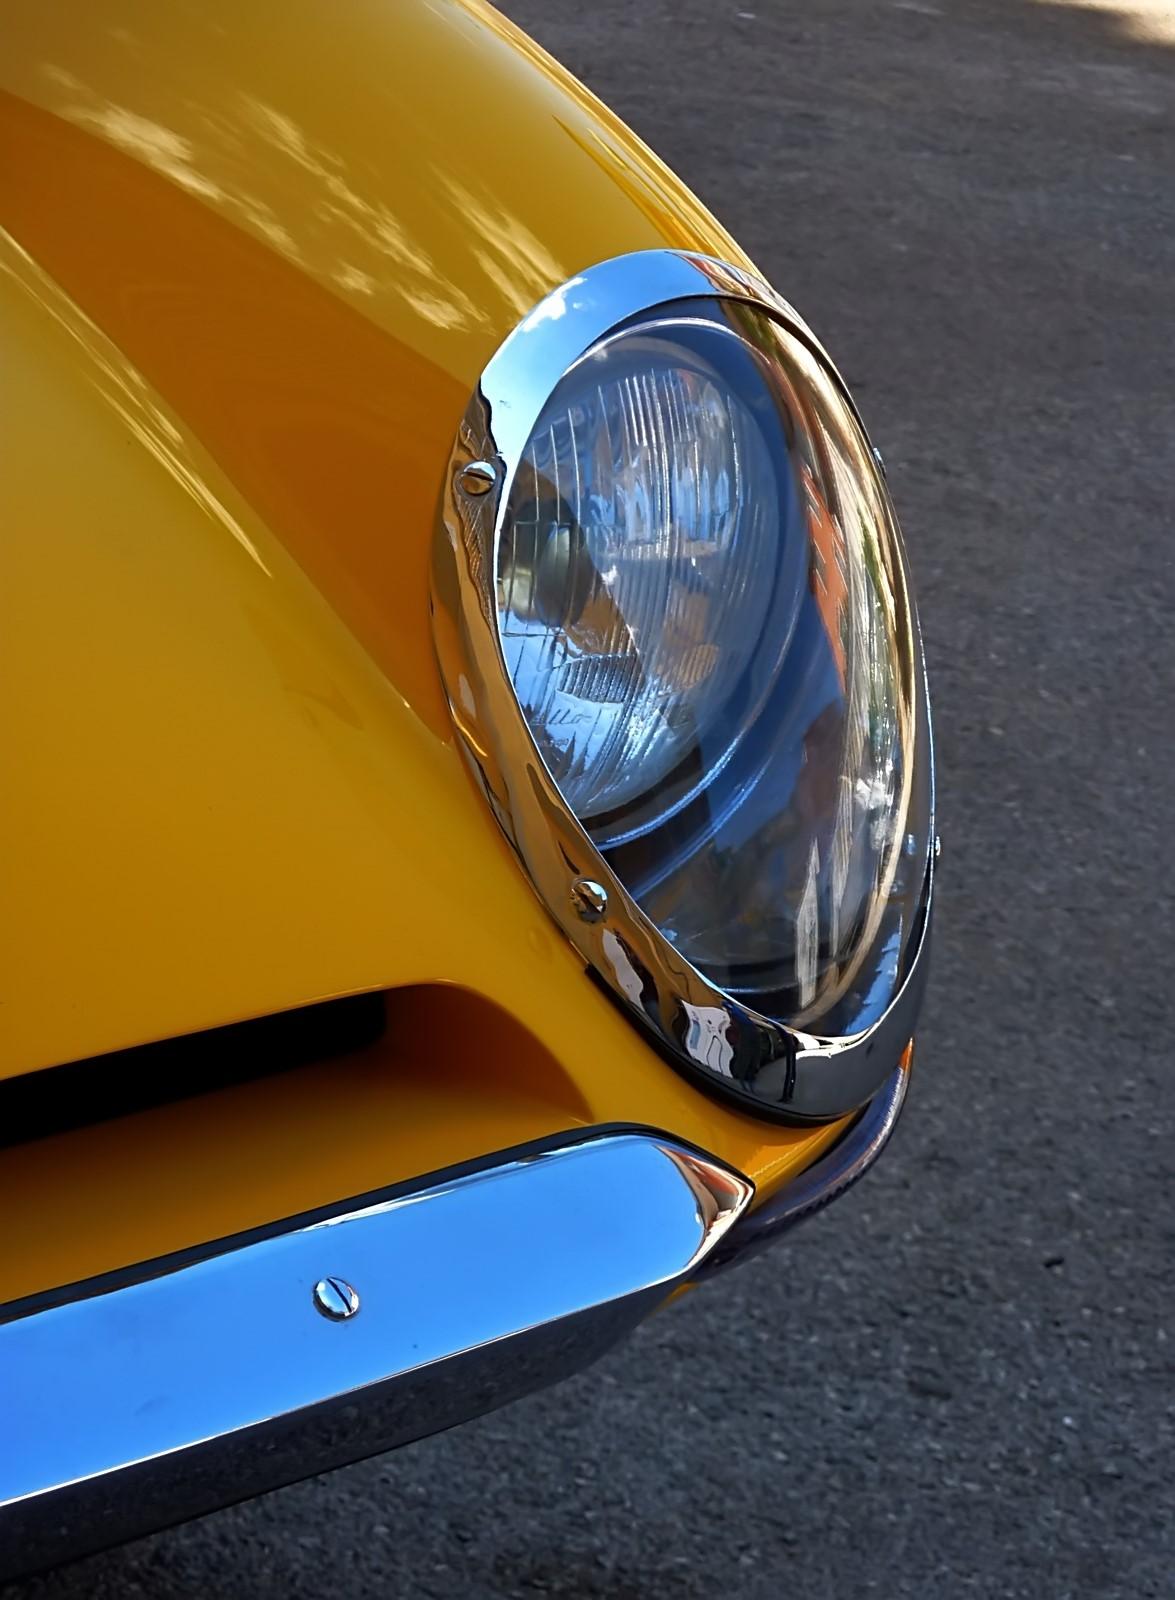 1966 Bizzarrini 5300 GT Strada (79).jpg